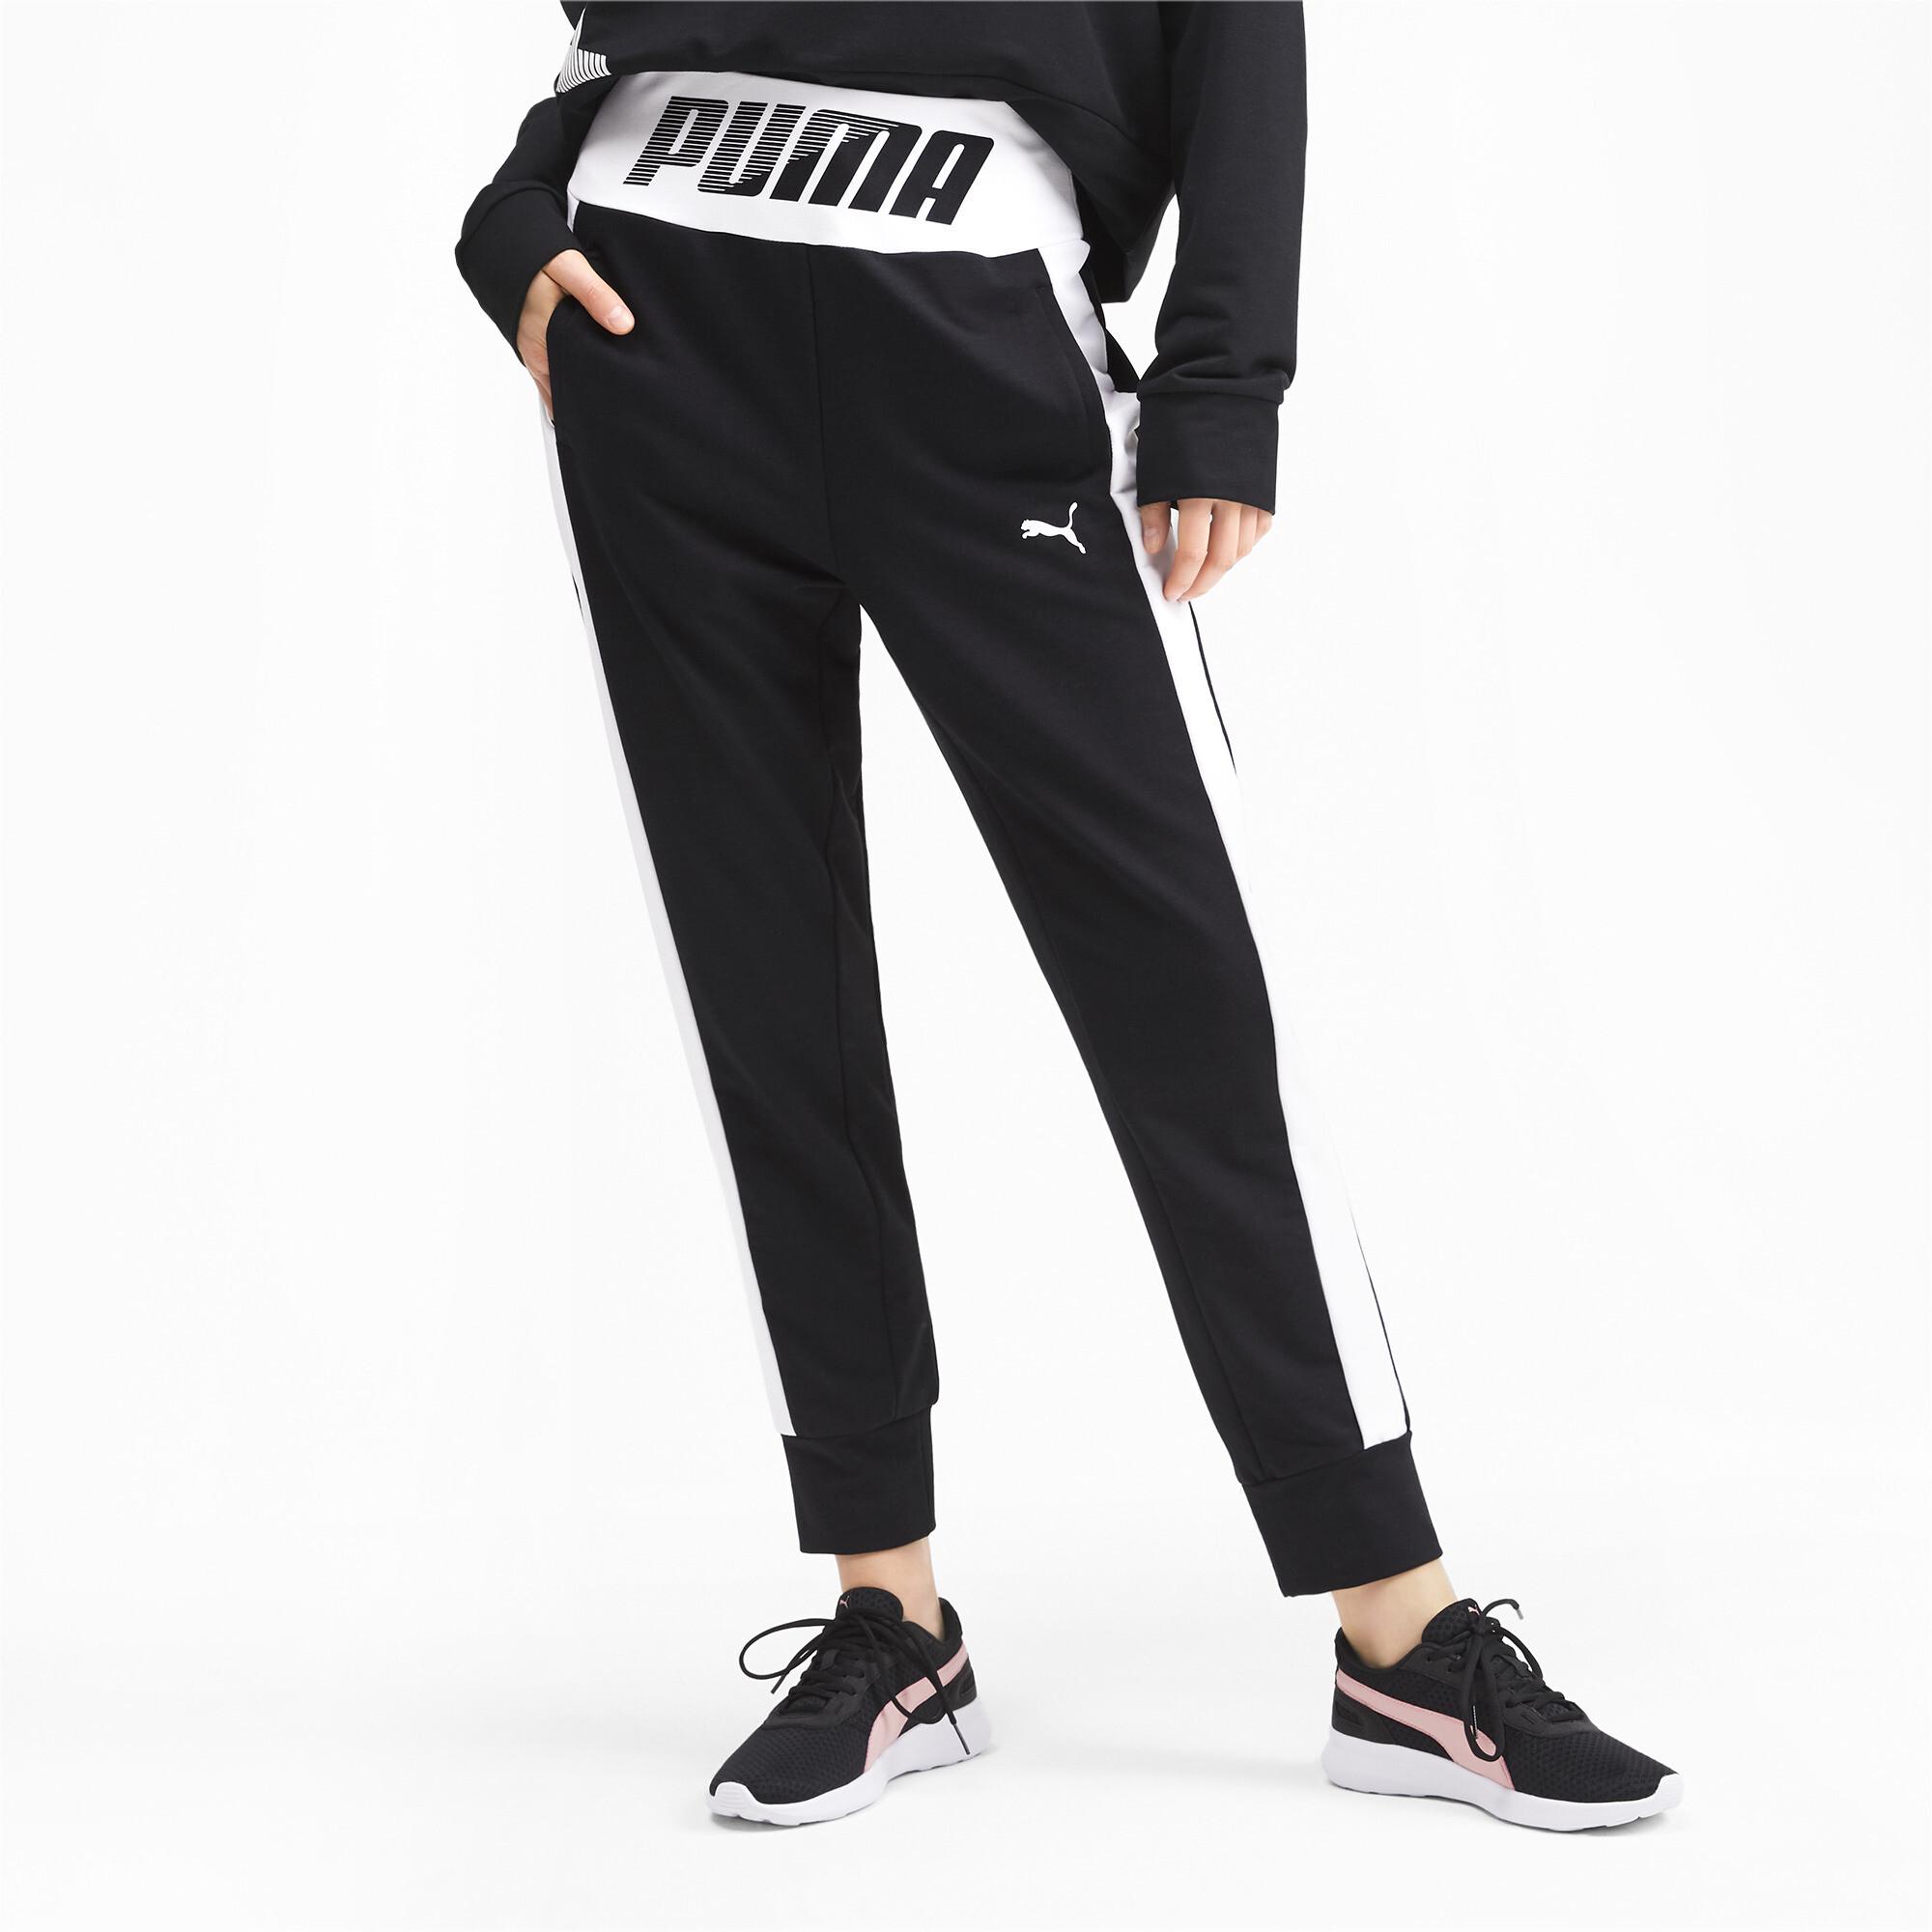 PUMA-Modern-Sports-Women-039-s-Track-Pants-Women-Knitted-Pants-Basics thumbnail 14